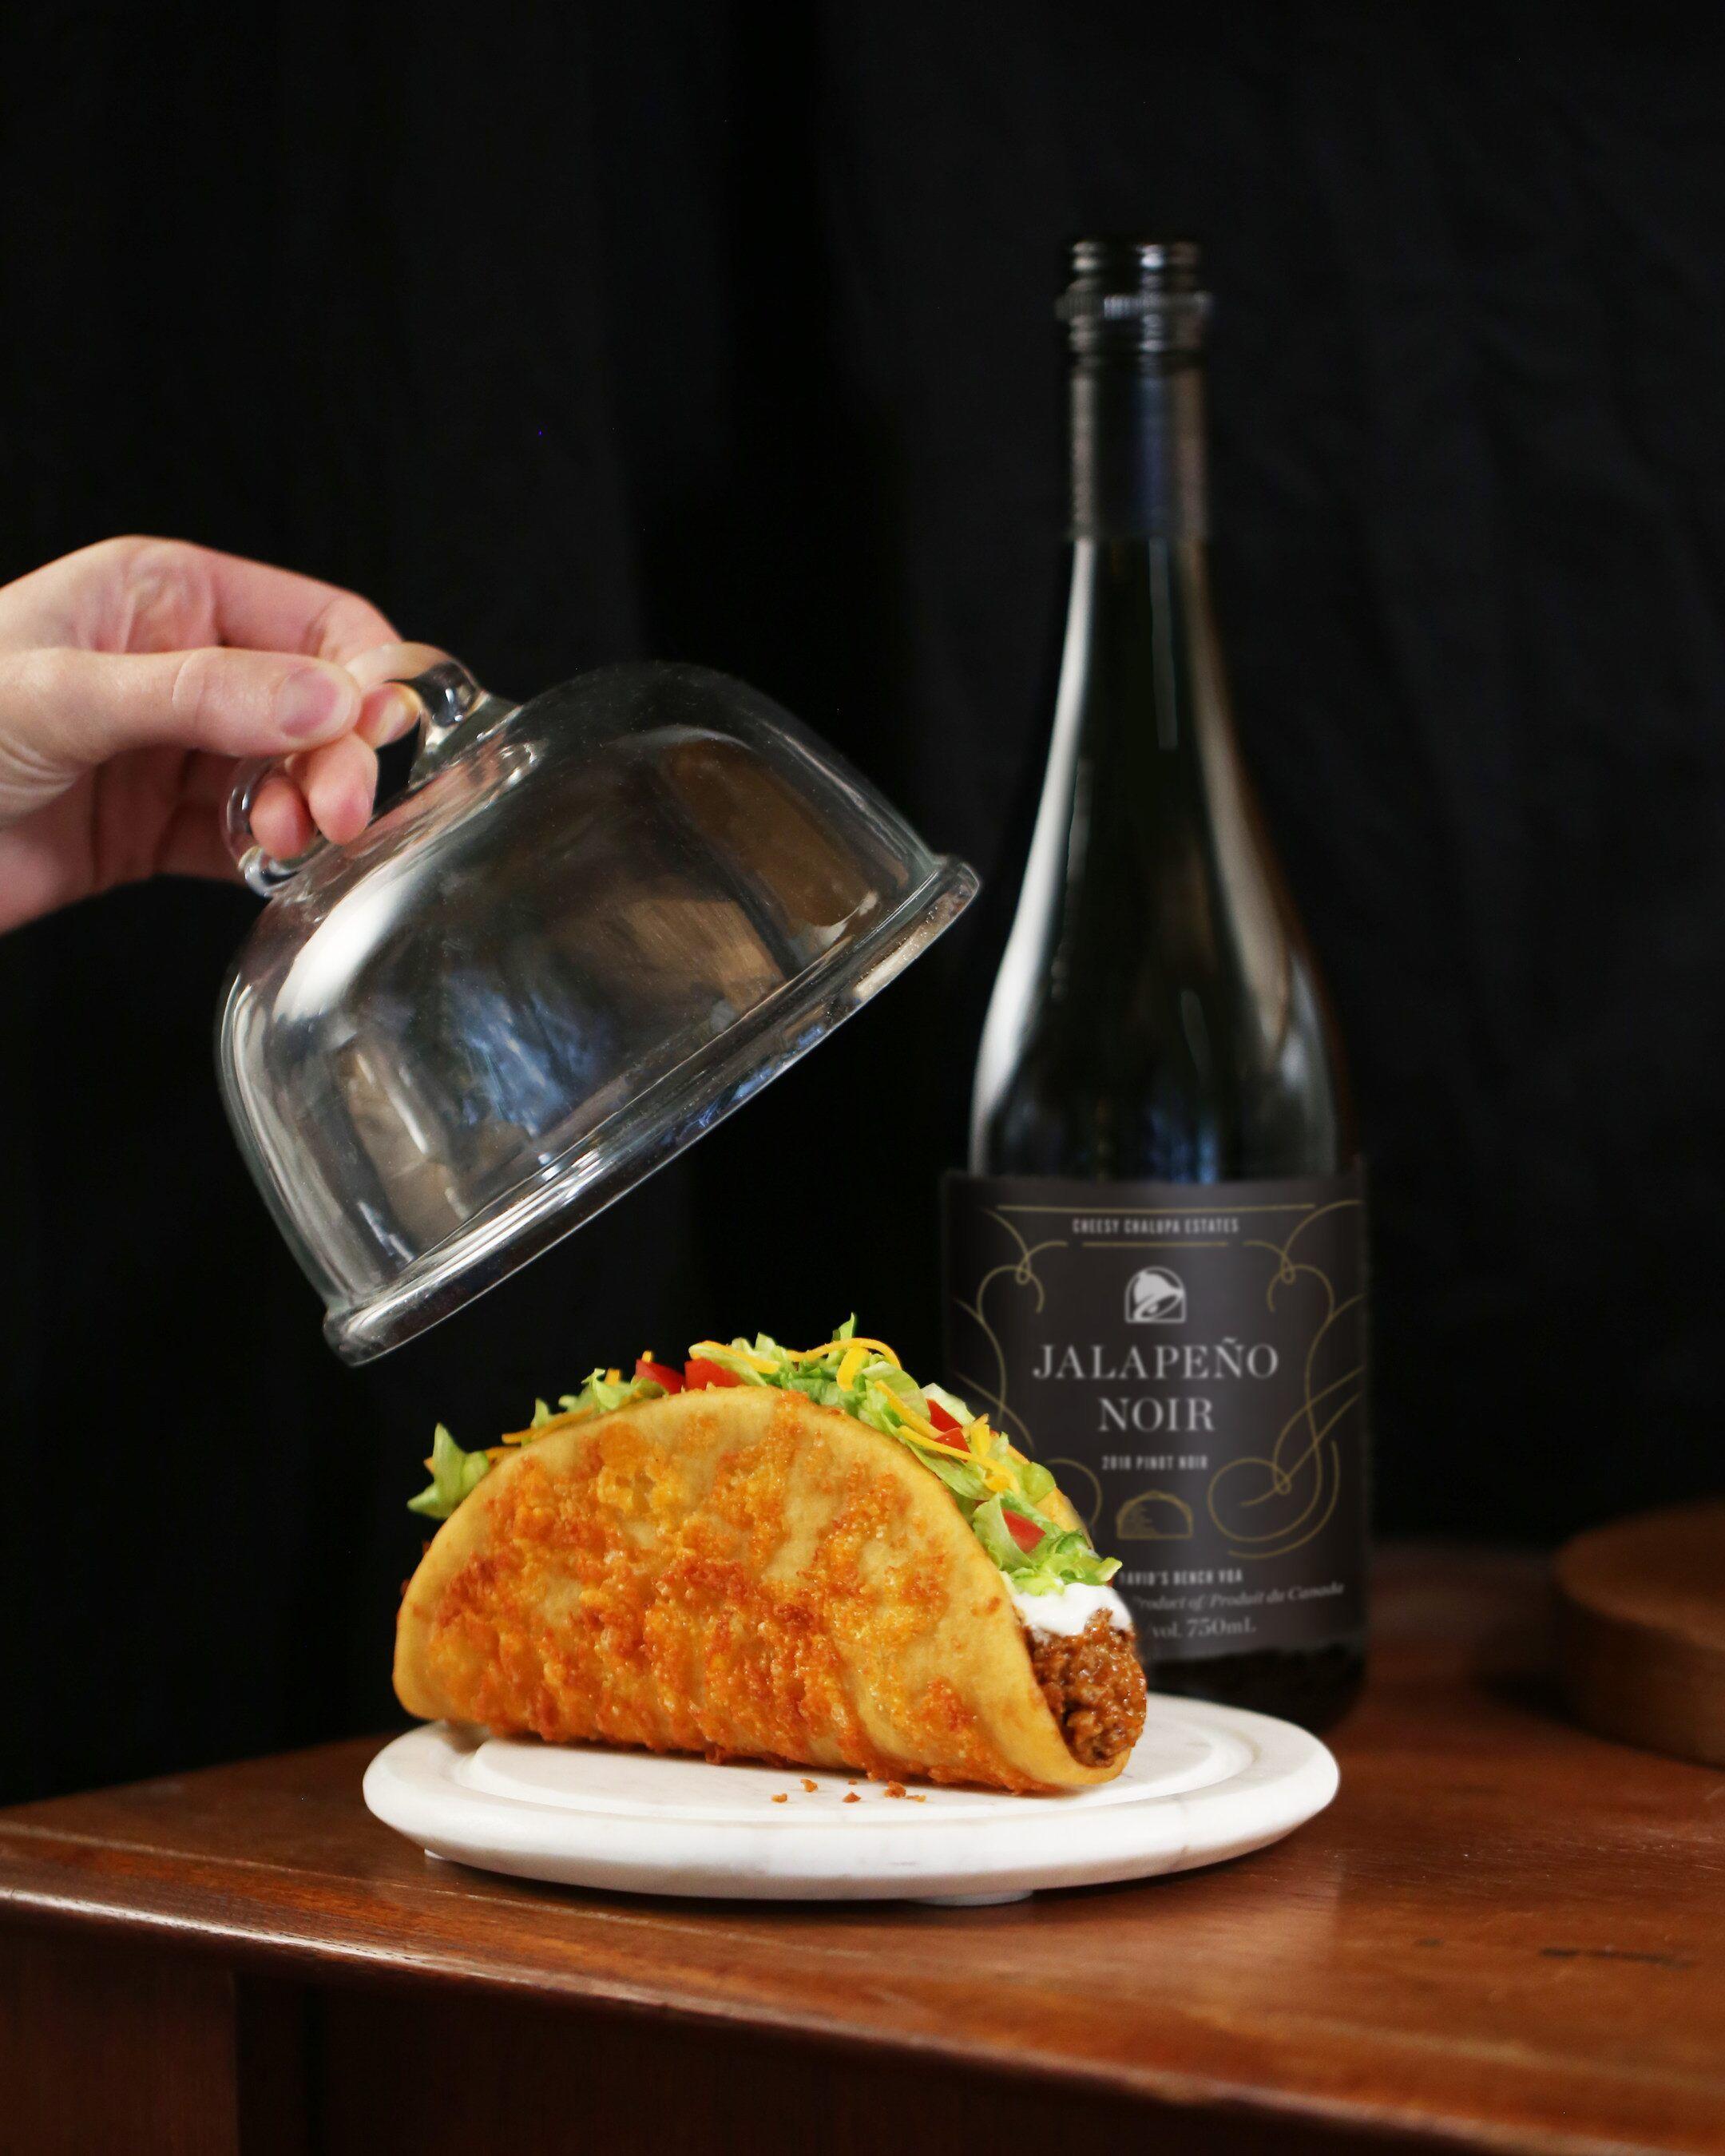 Taco Bell debuting 'Jalapeno Noir' wine in Canada